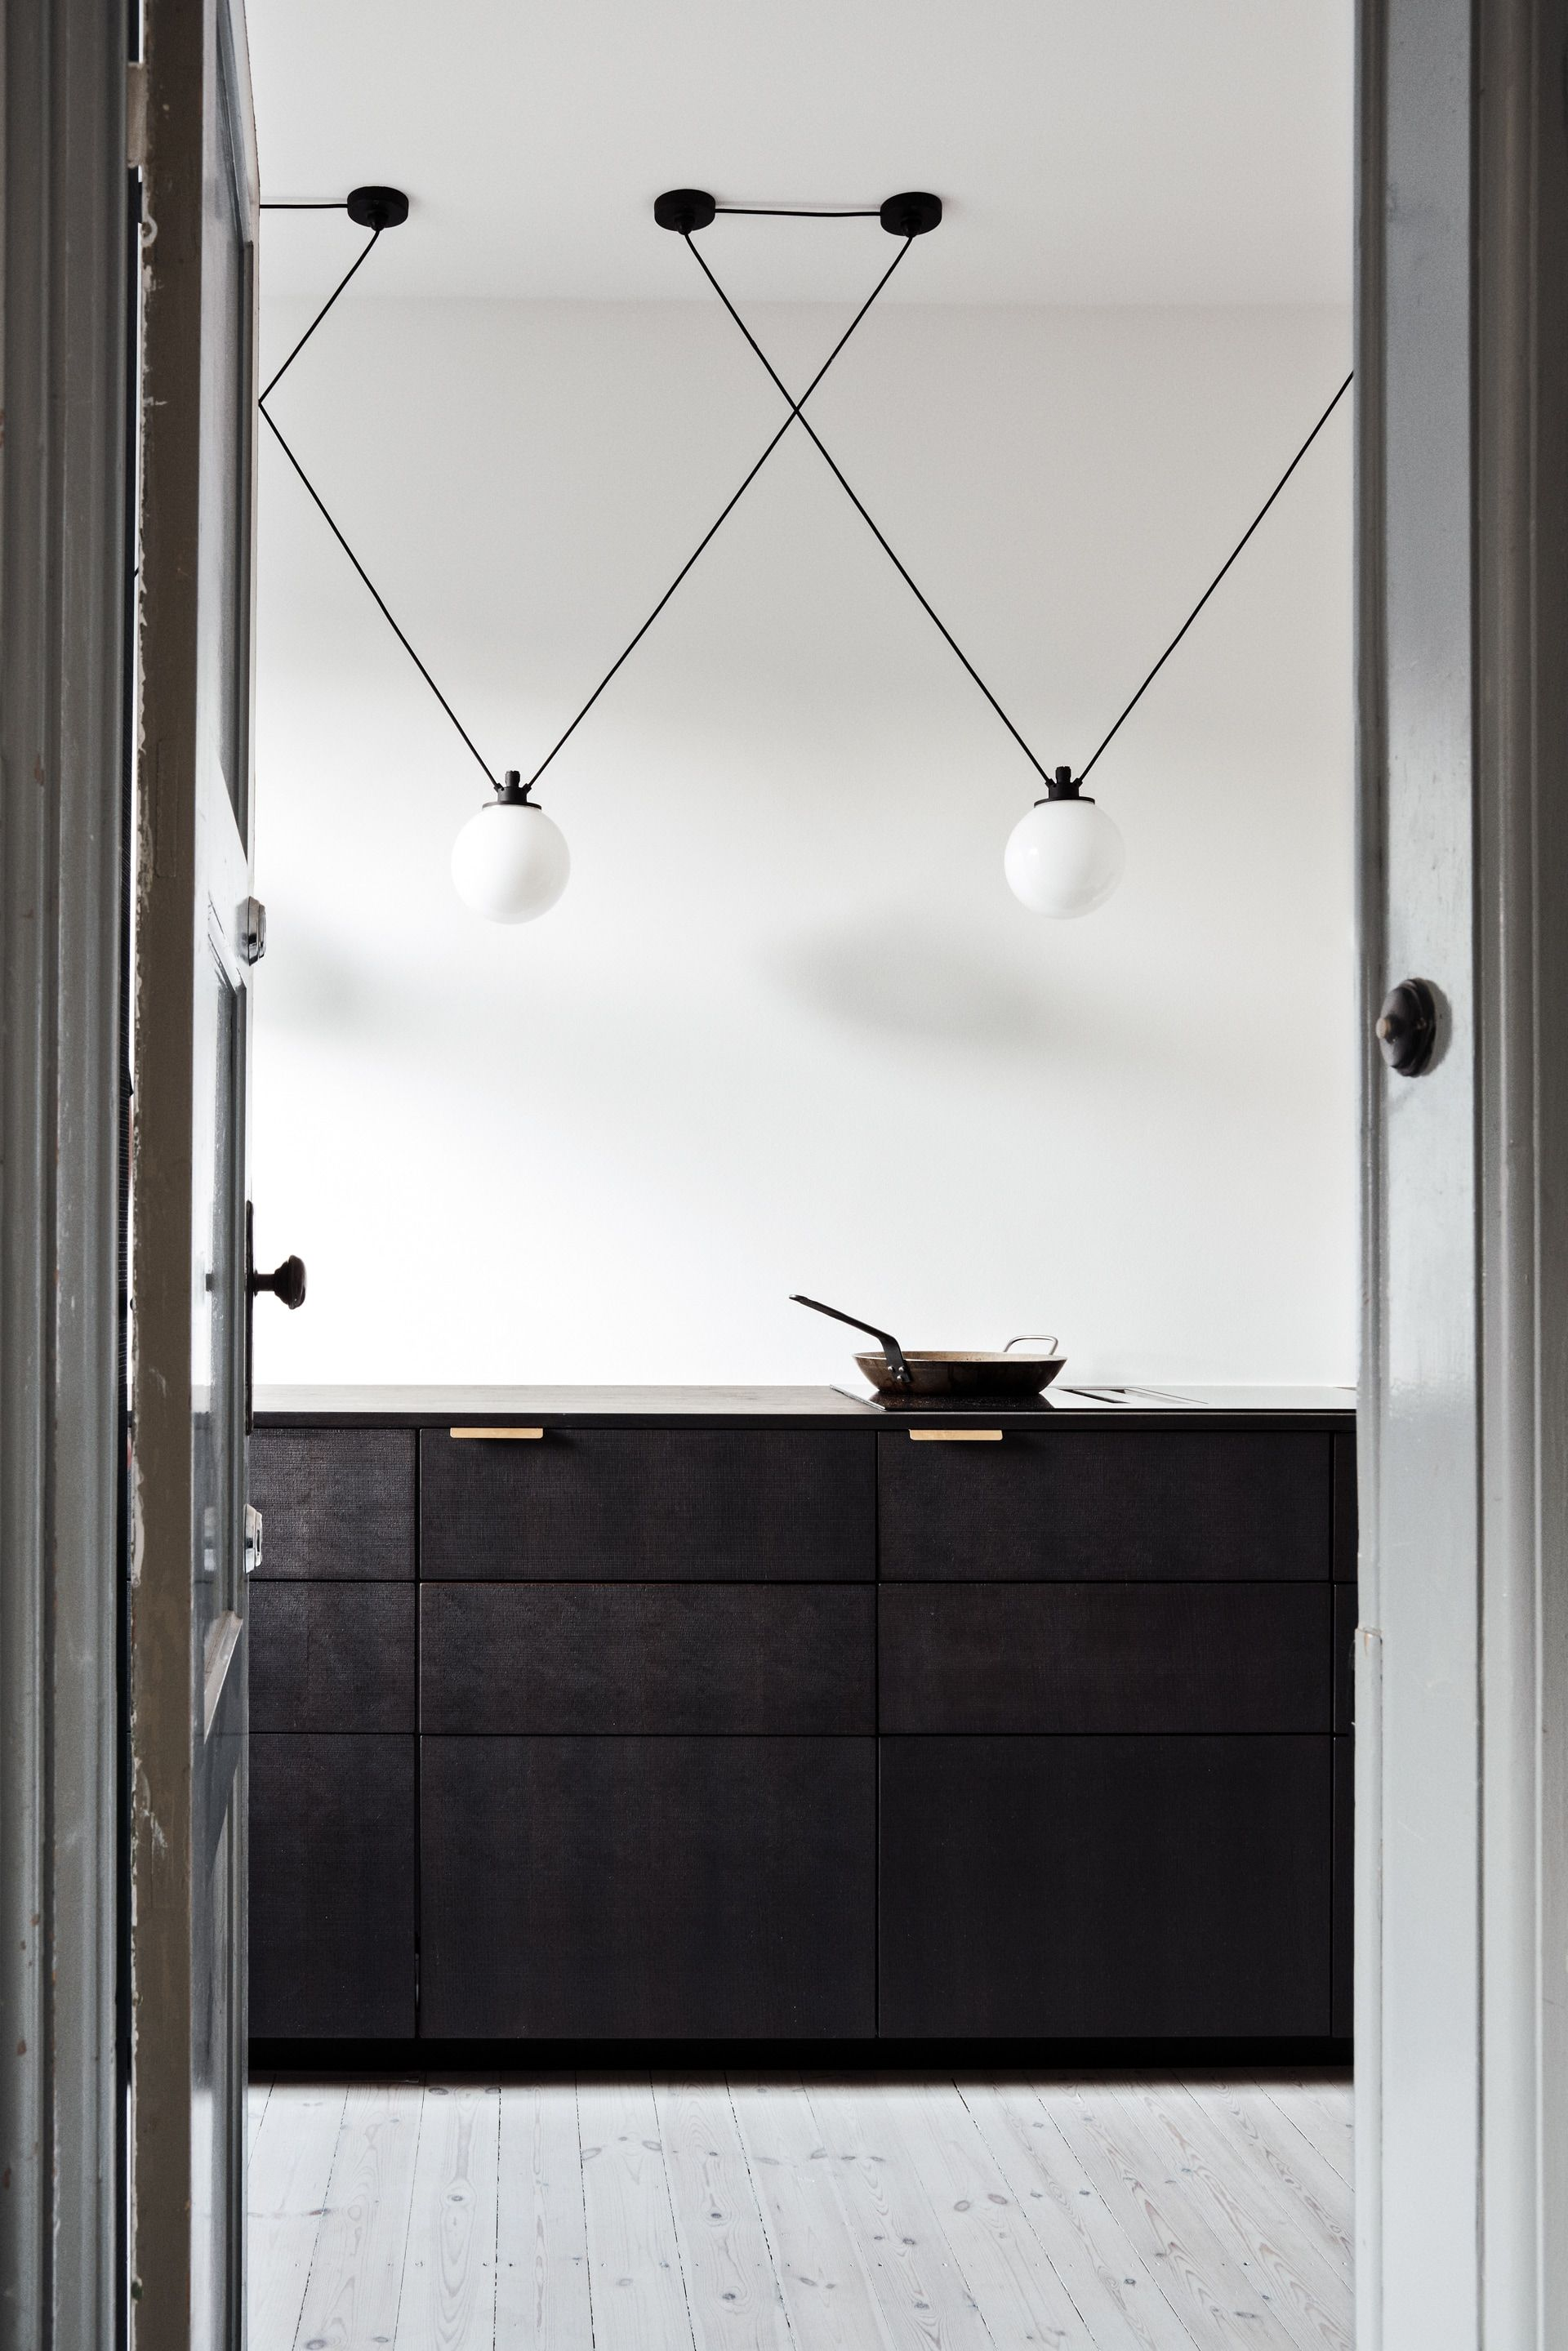 Interior Design Fai Da Te inspiration: h. schneekloths vej, copenhagen in 2020